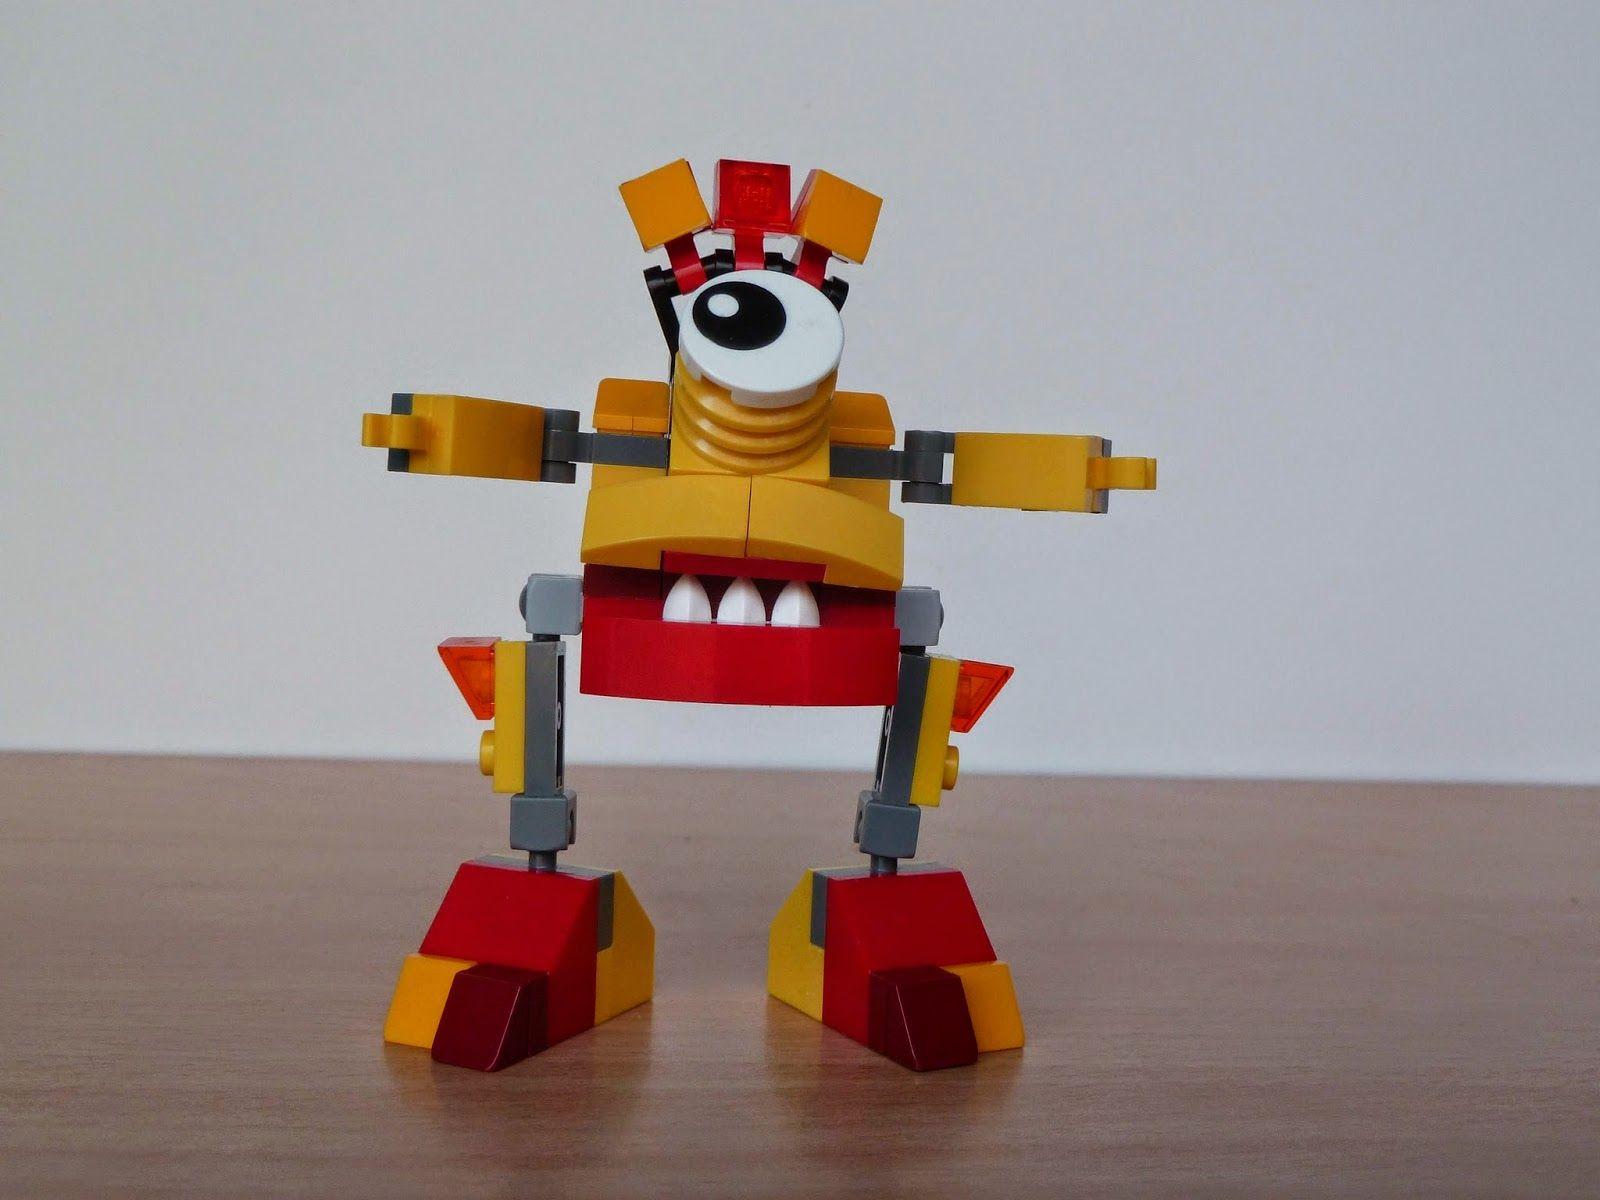 Totobricks: VULK ZAPTOR MURP LEGO MIXELS Série 1 Lego 41501 Lego 41507 http://www.totobricks.com/2015/01/vulk-zaptor-murp-lego-mixels-serie-1.html